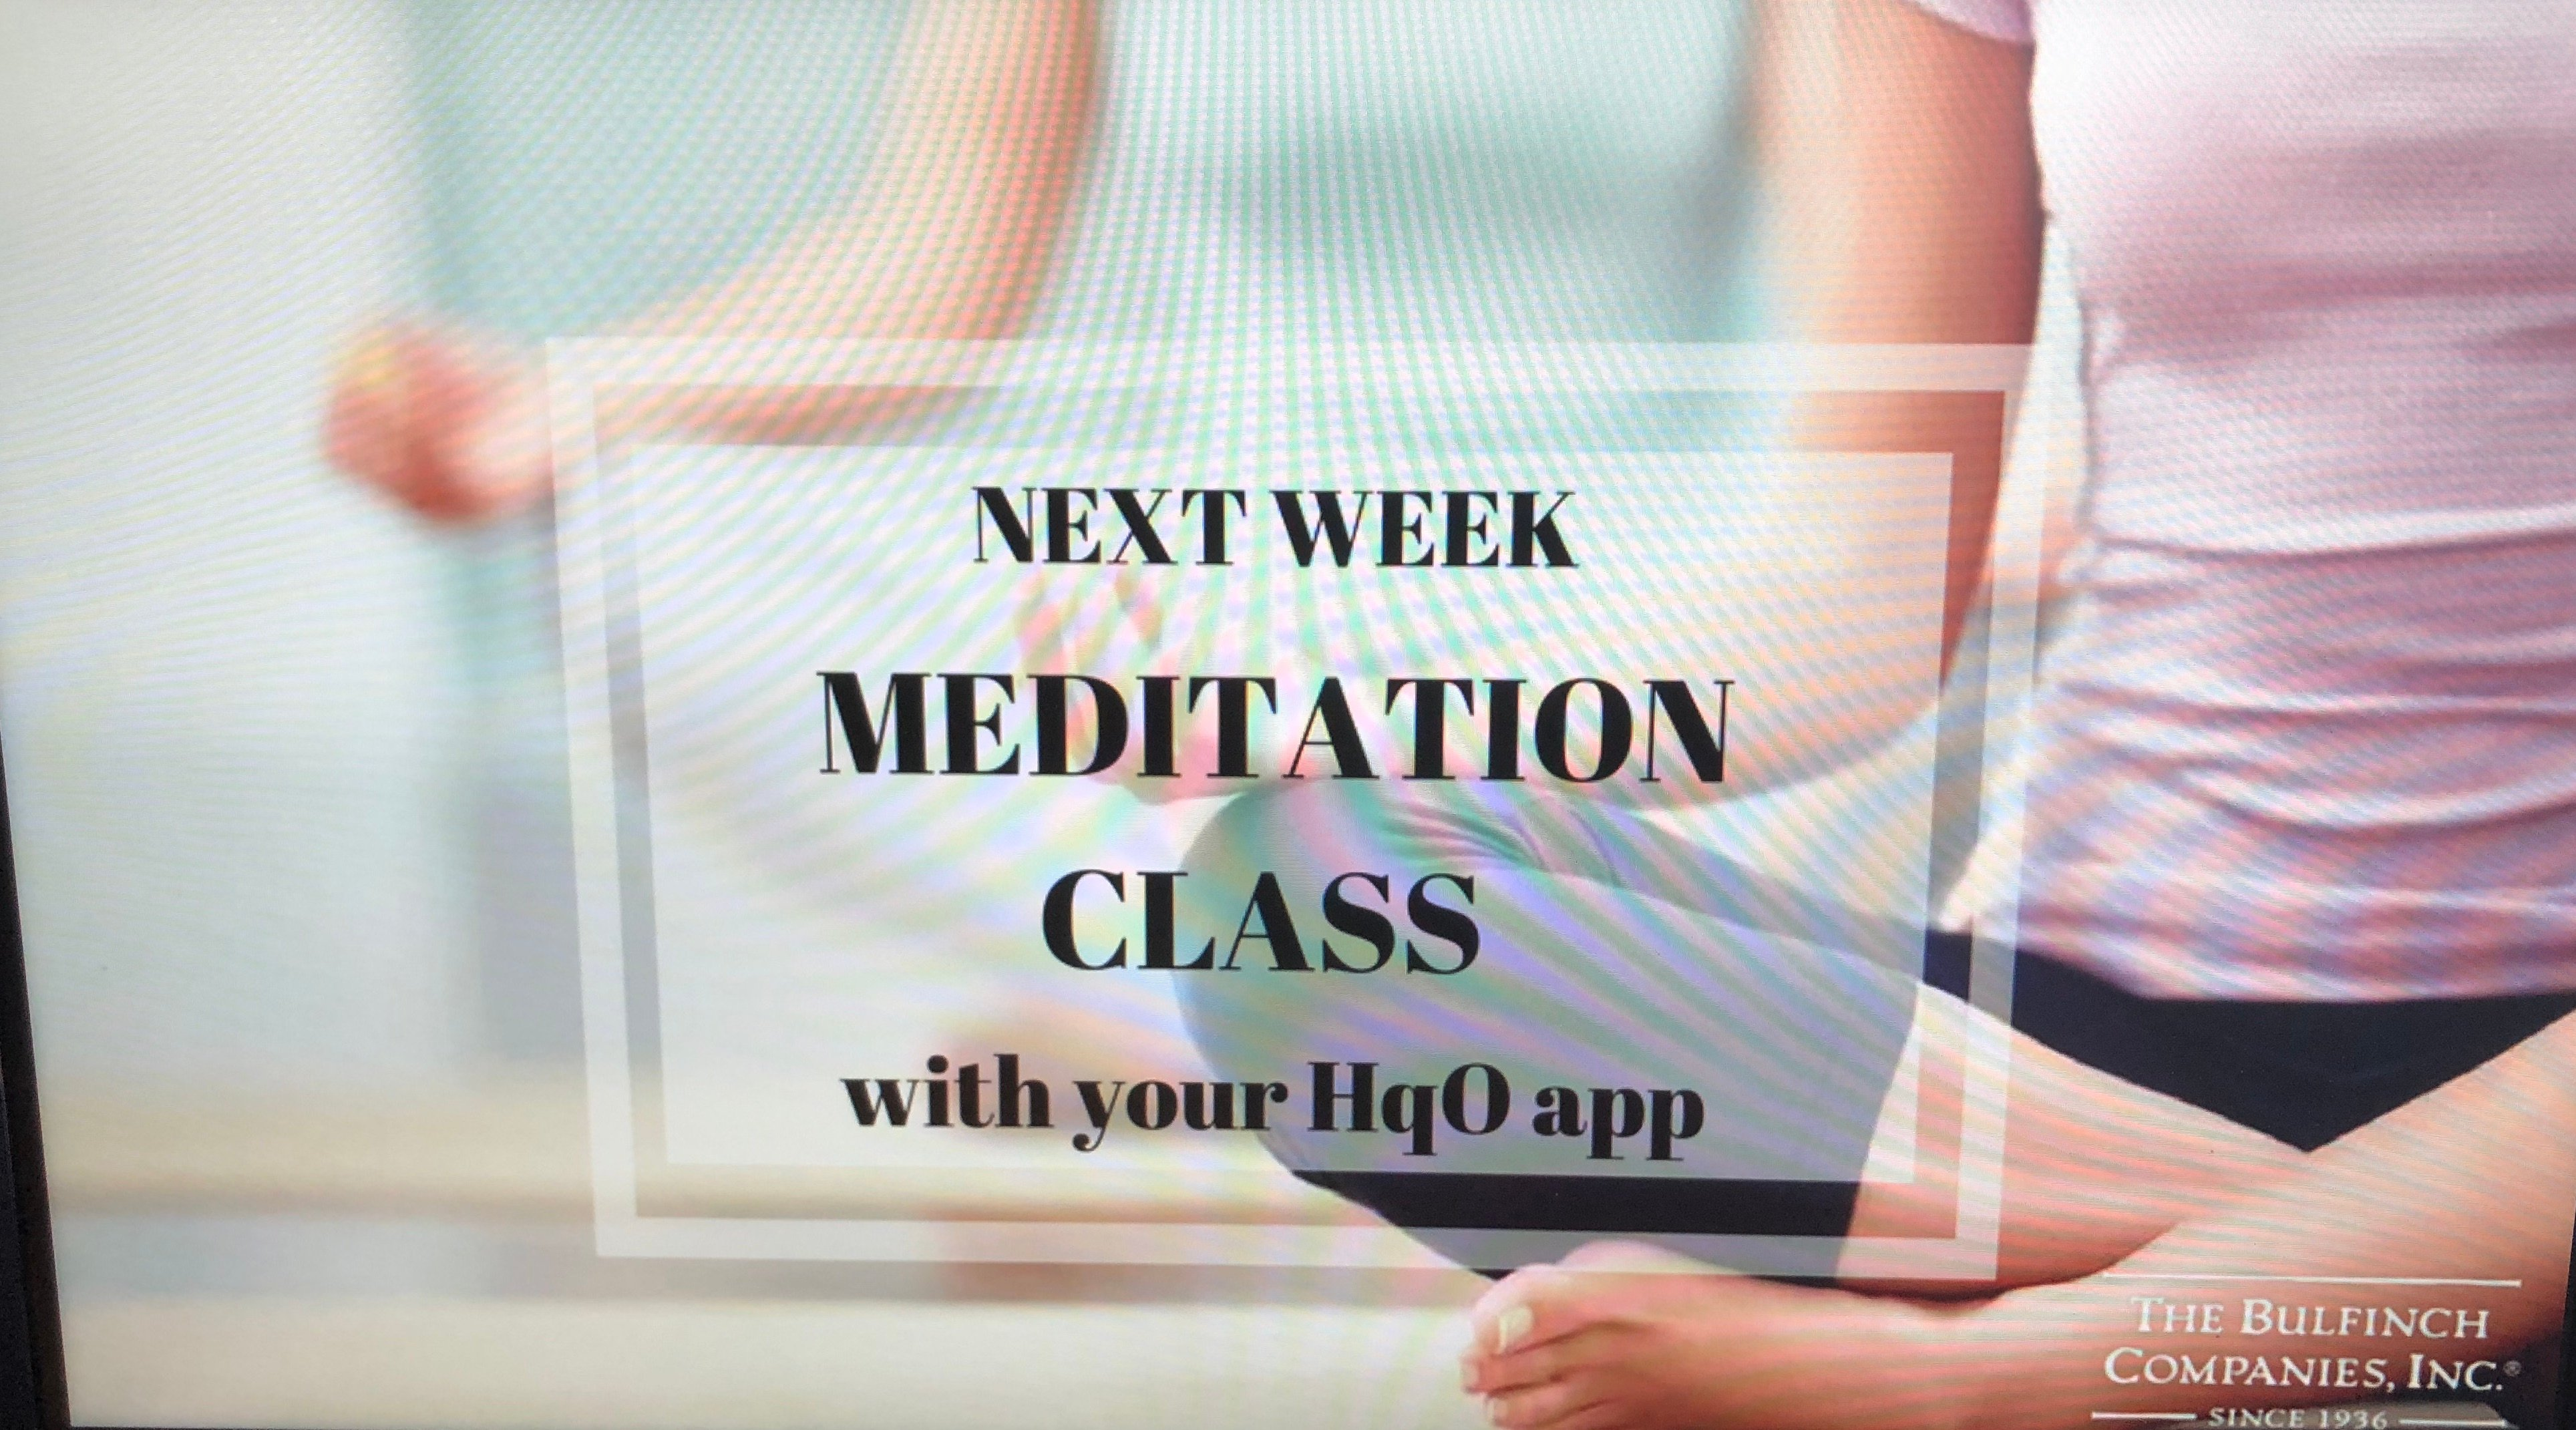 meditationneedham